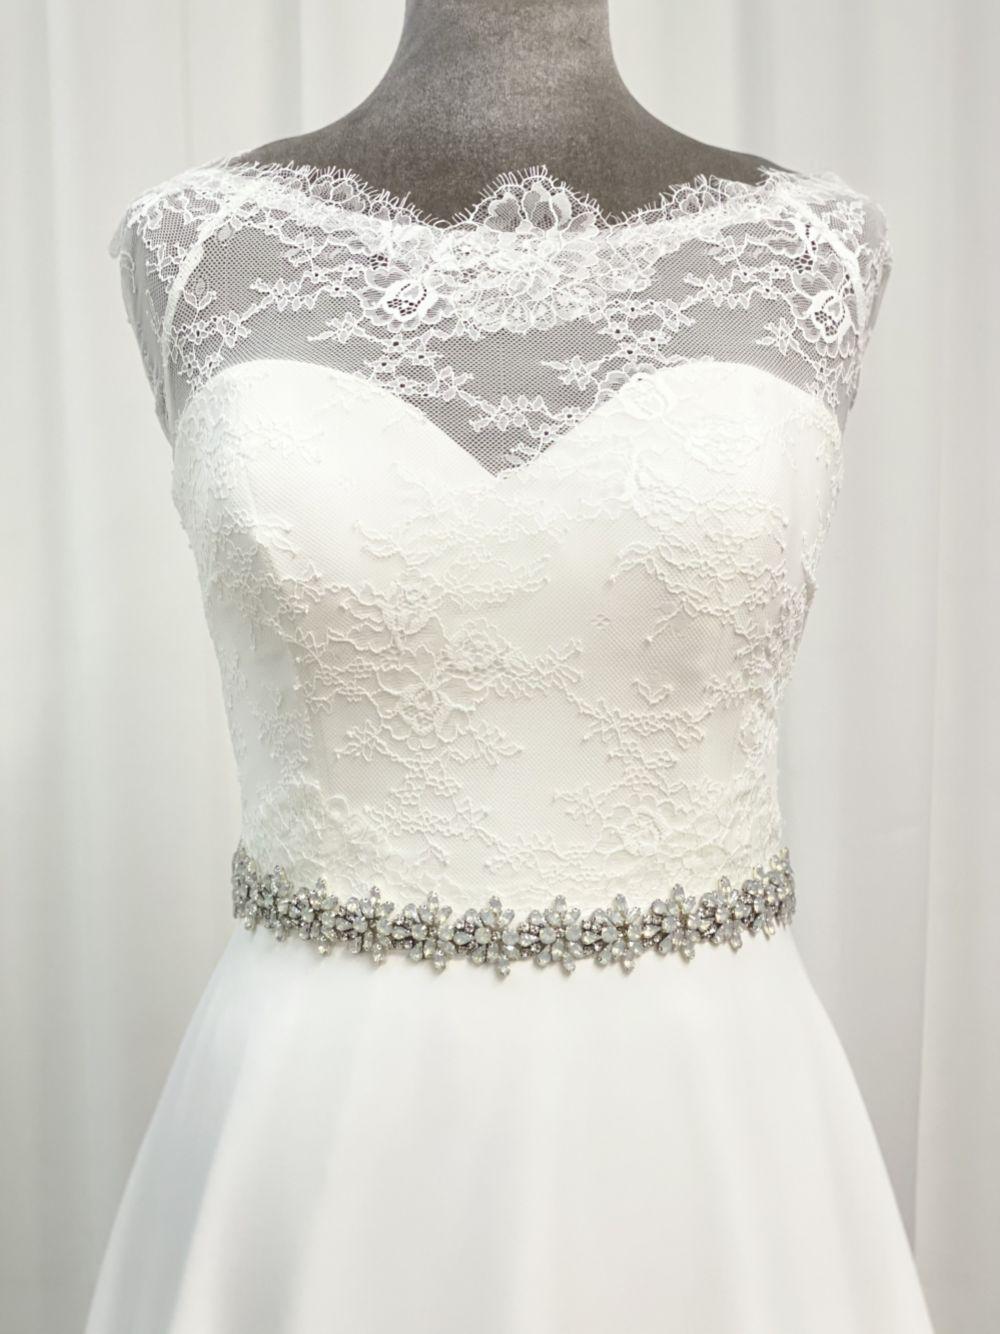 Perfect Bridal Brooke Opal Crystal Wedding Dress Belt